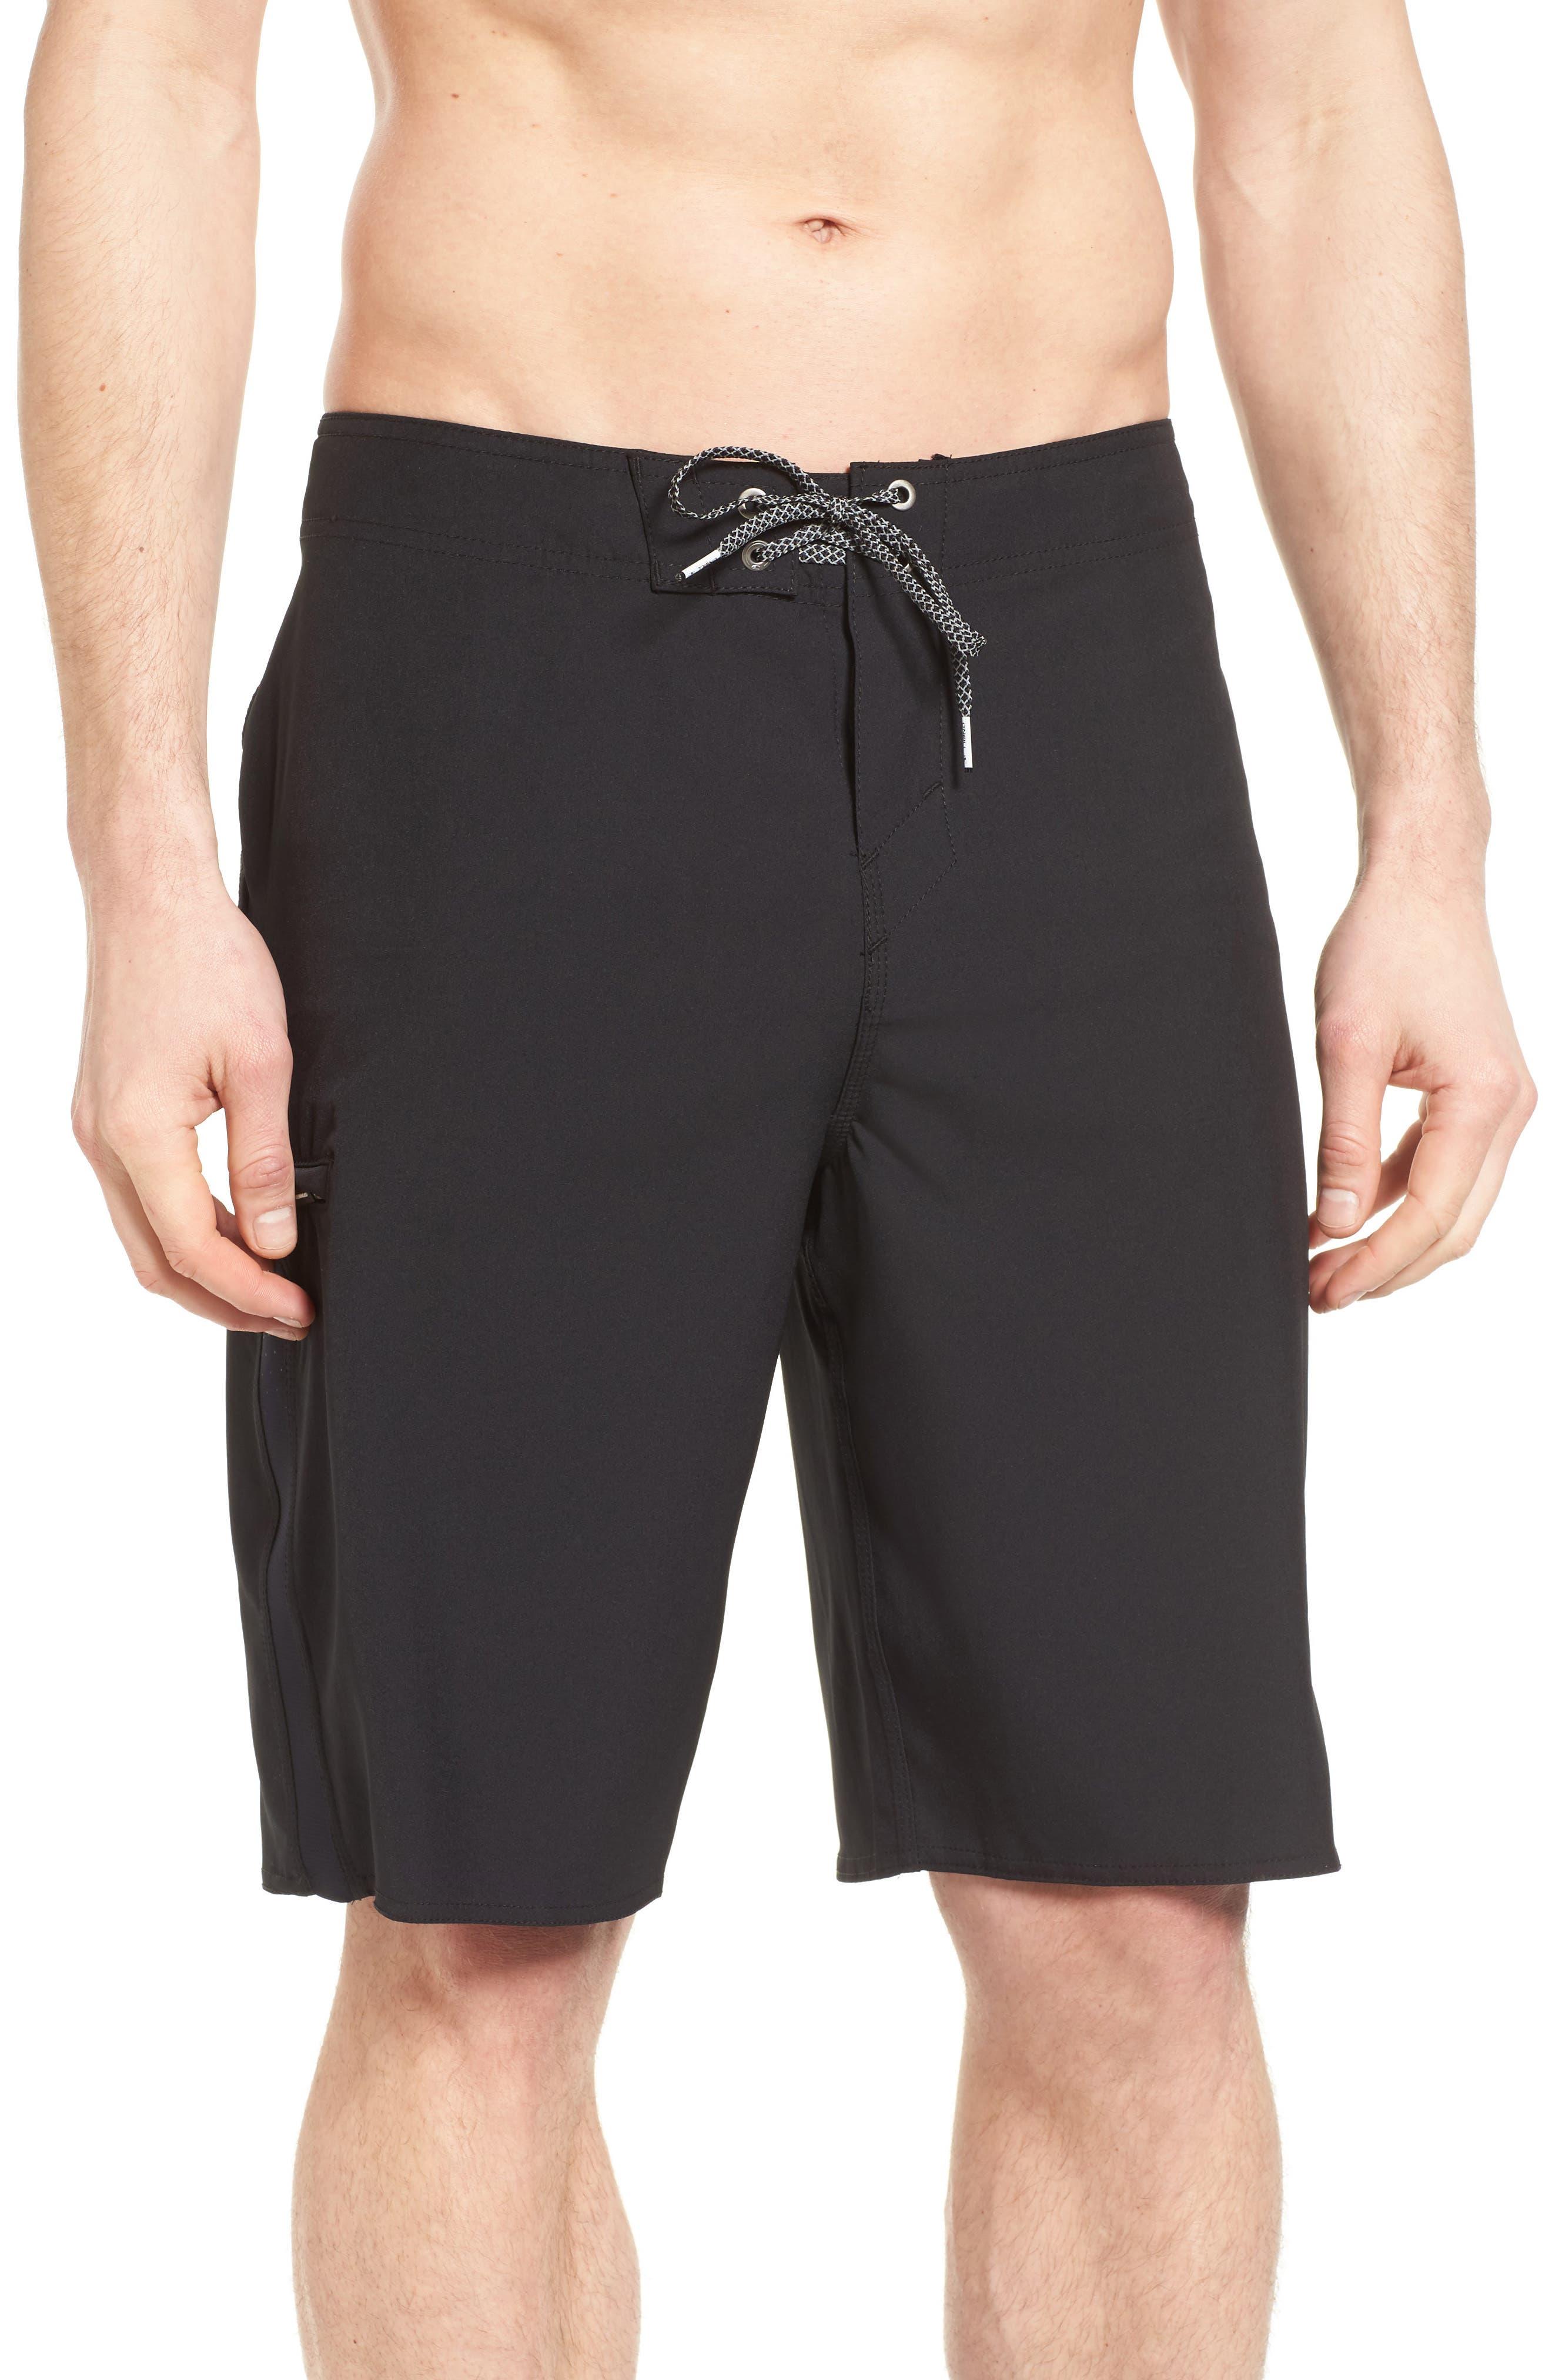 Superfreak Board Shorts,                             Main thumbnail 1, color,                             Black